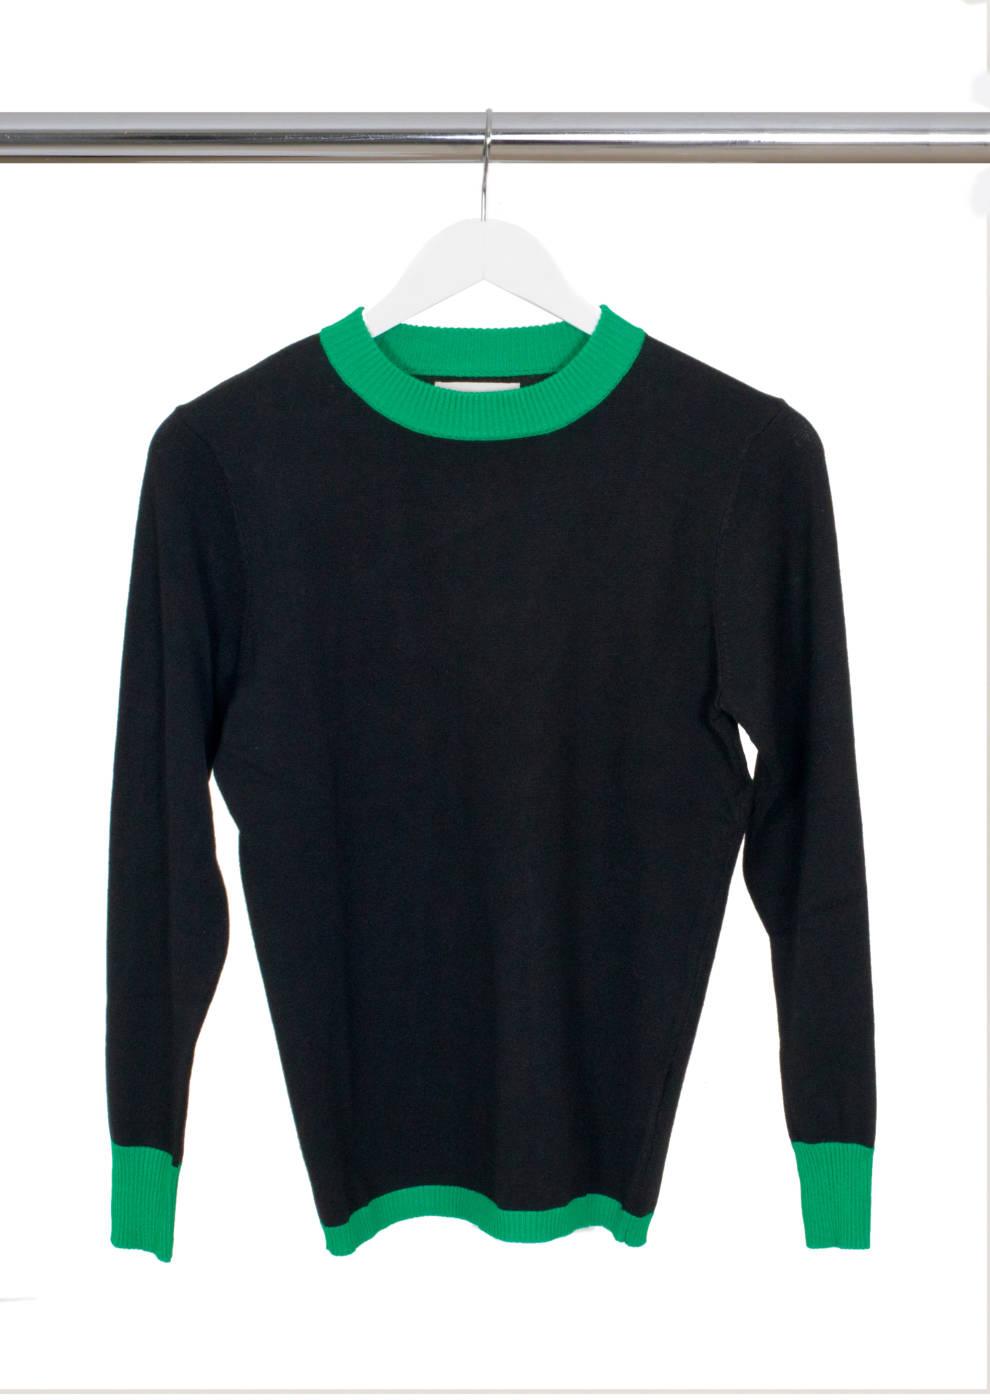 6.GreenBlack